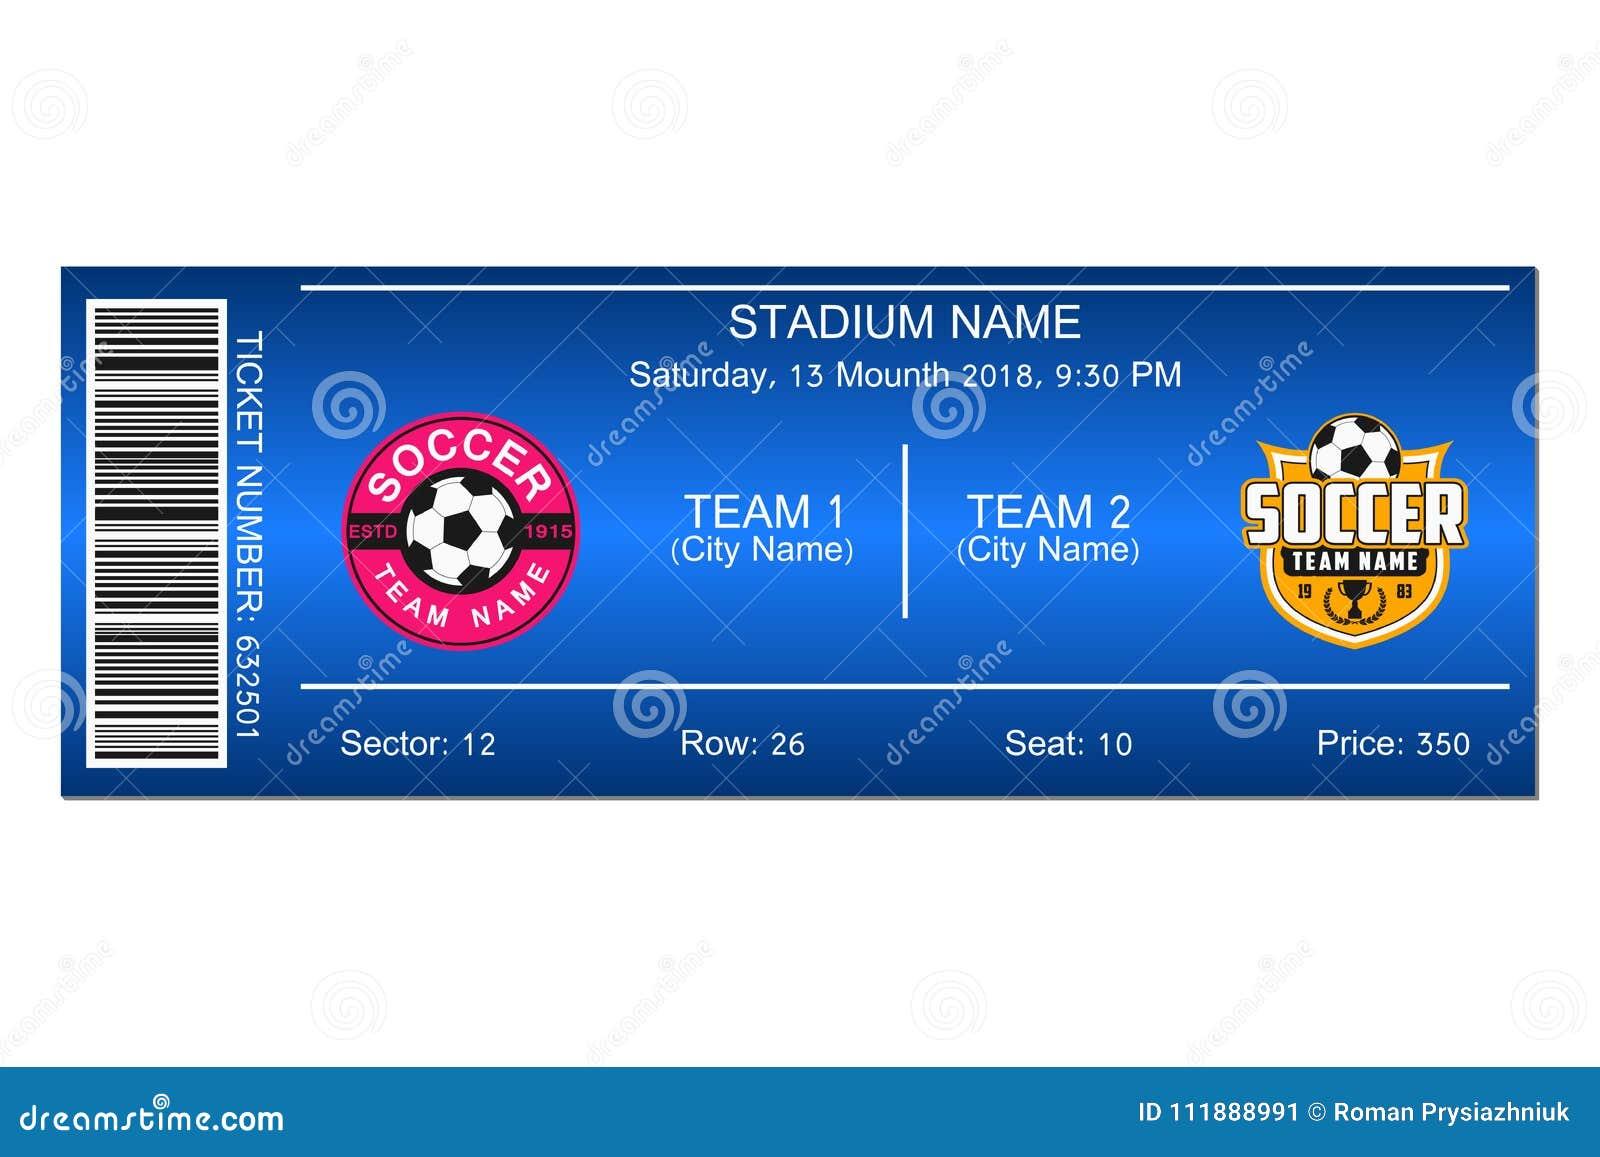 soccer ticket template design for football stadium ticket vector